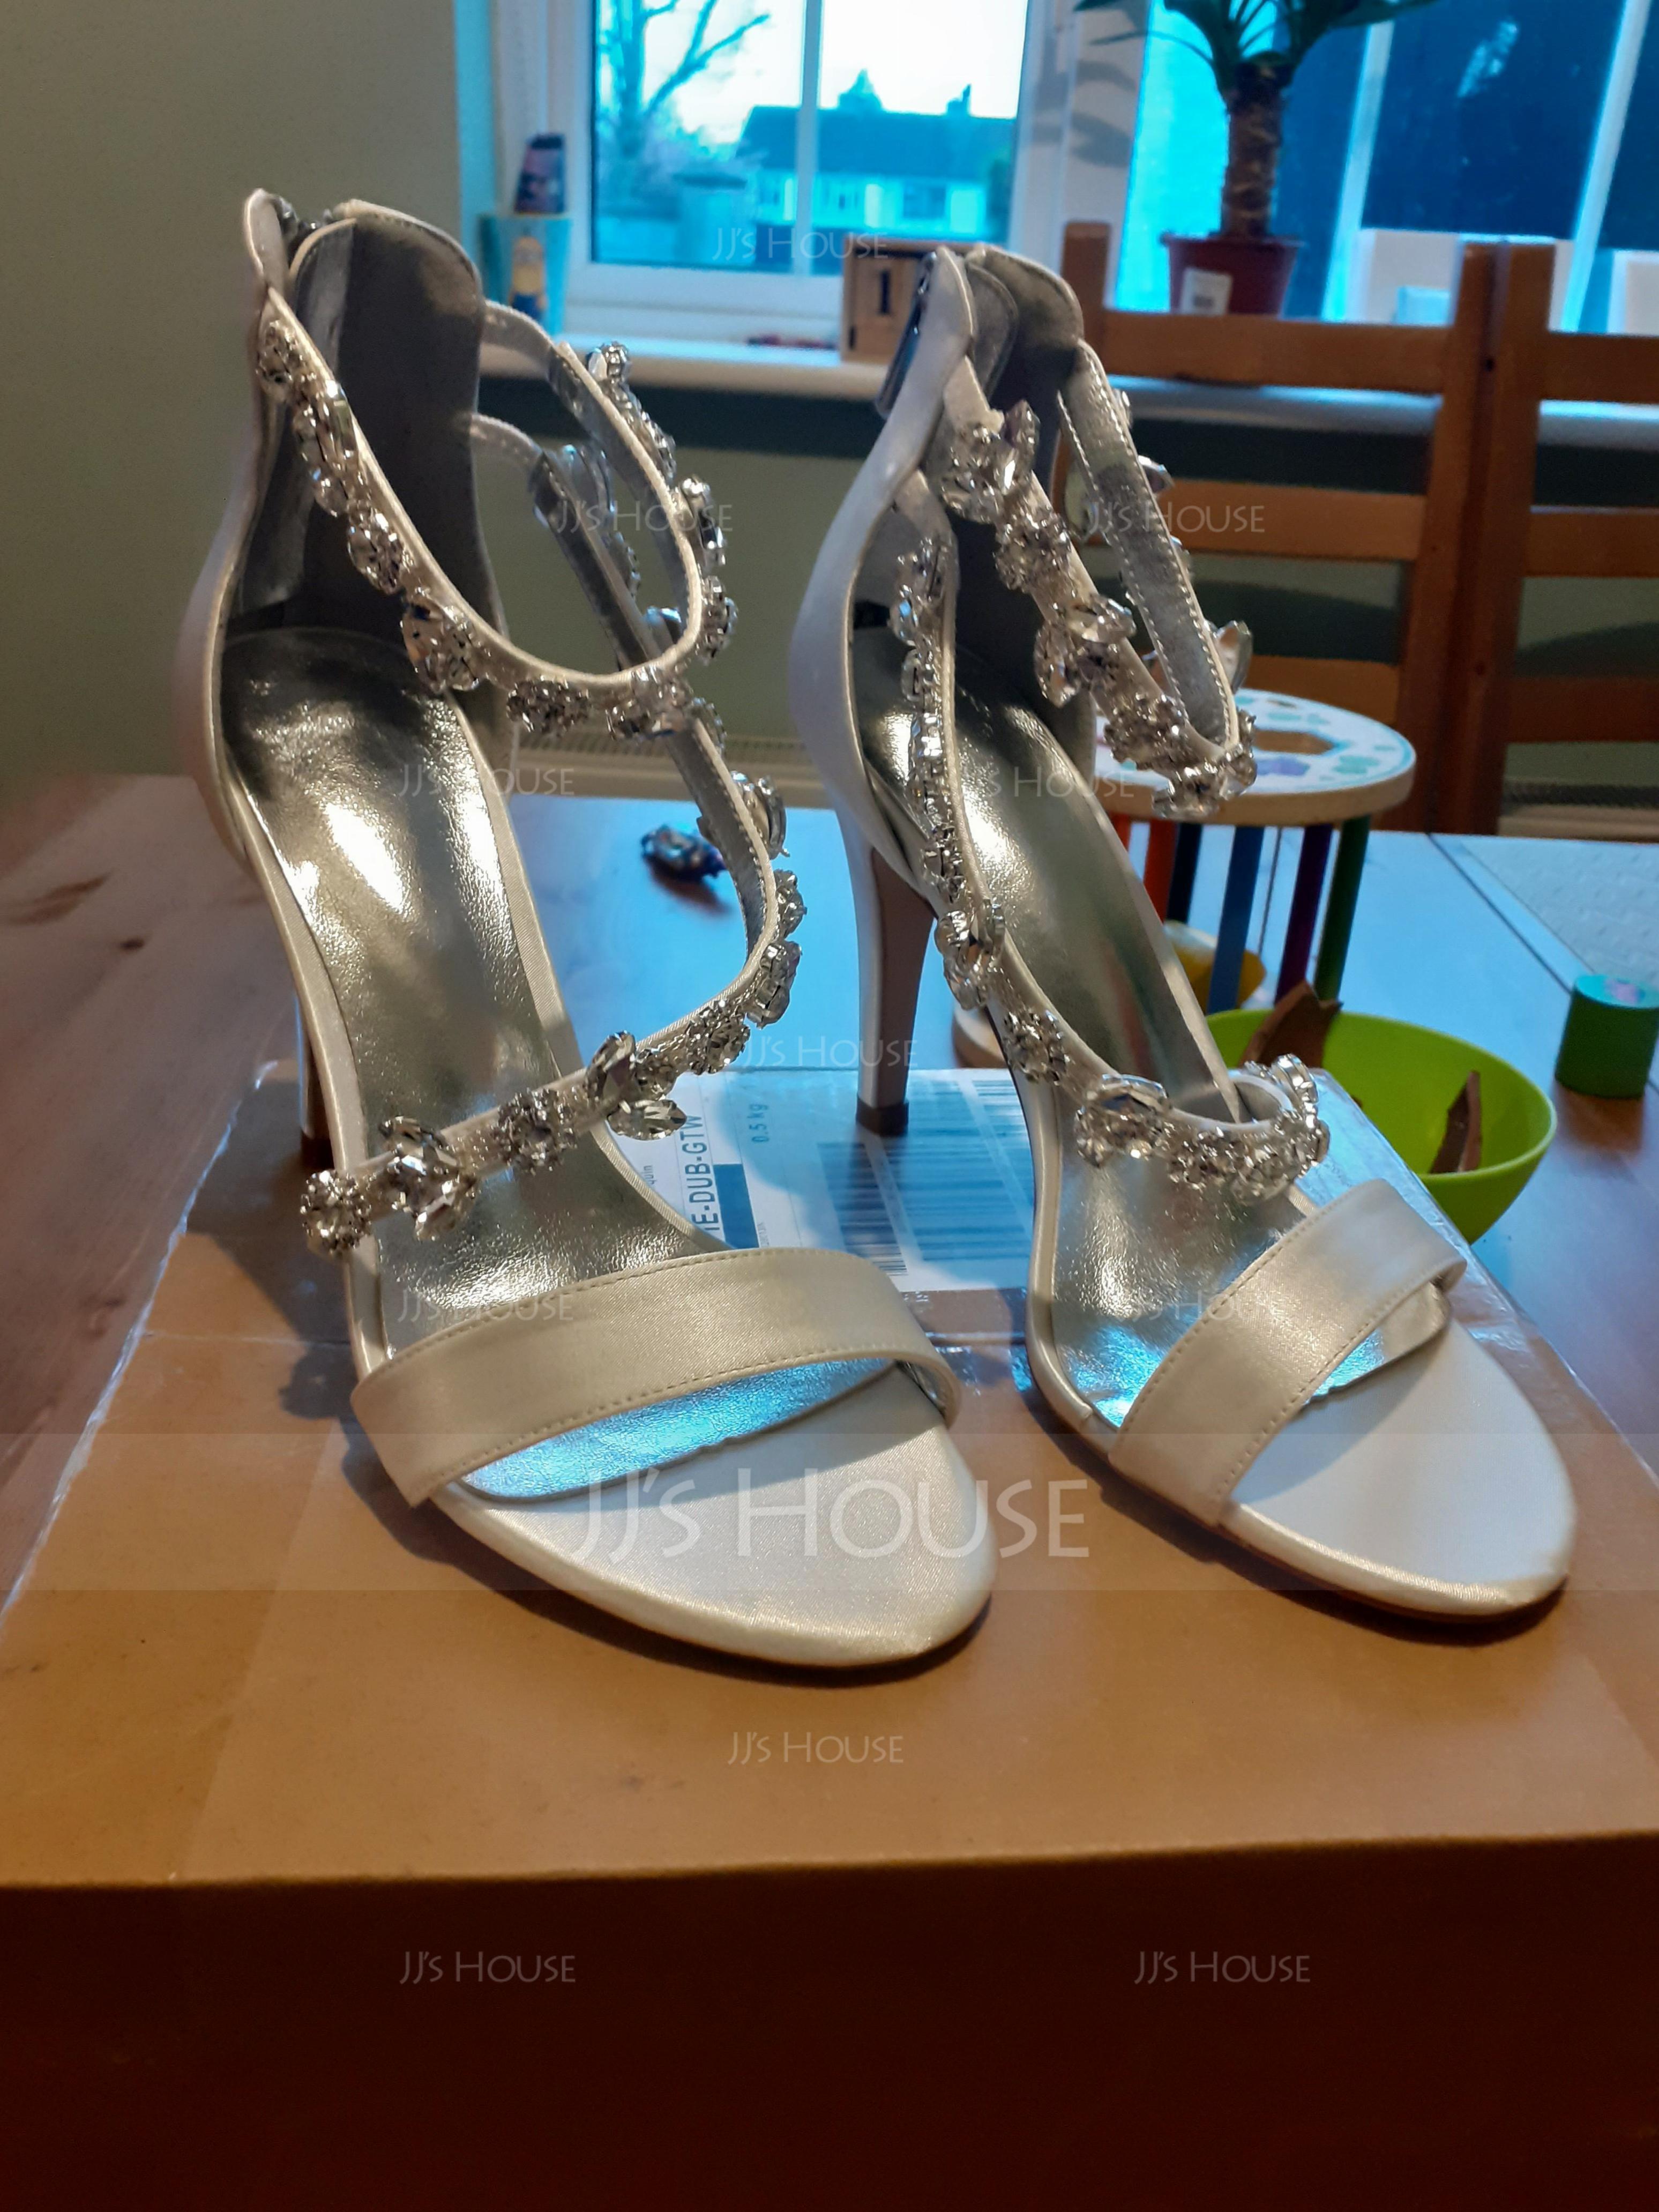 Women's Silk Like Satin Stiletto Heel Peep Toe Pumps Sandals (273214837)